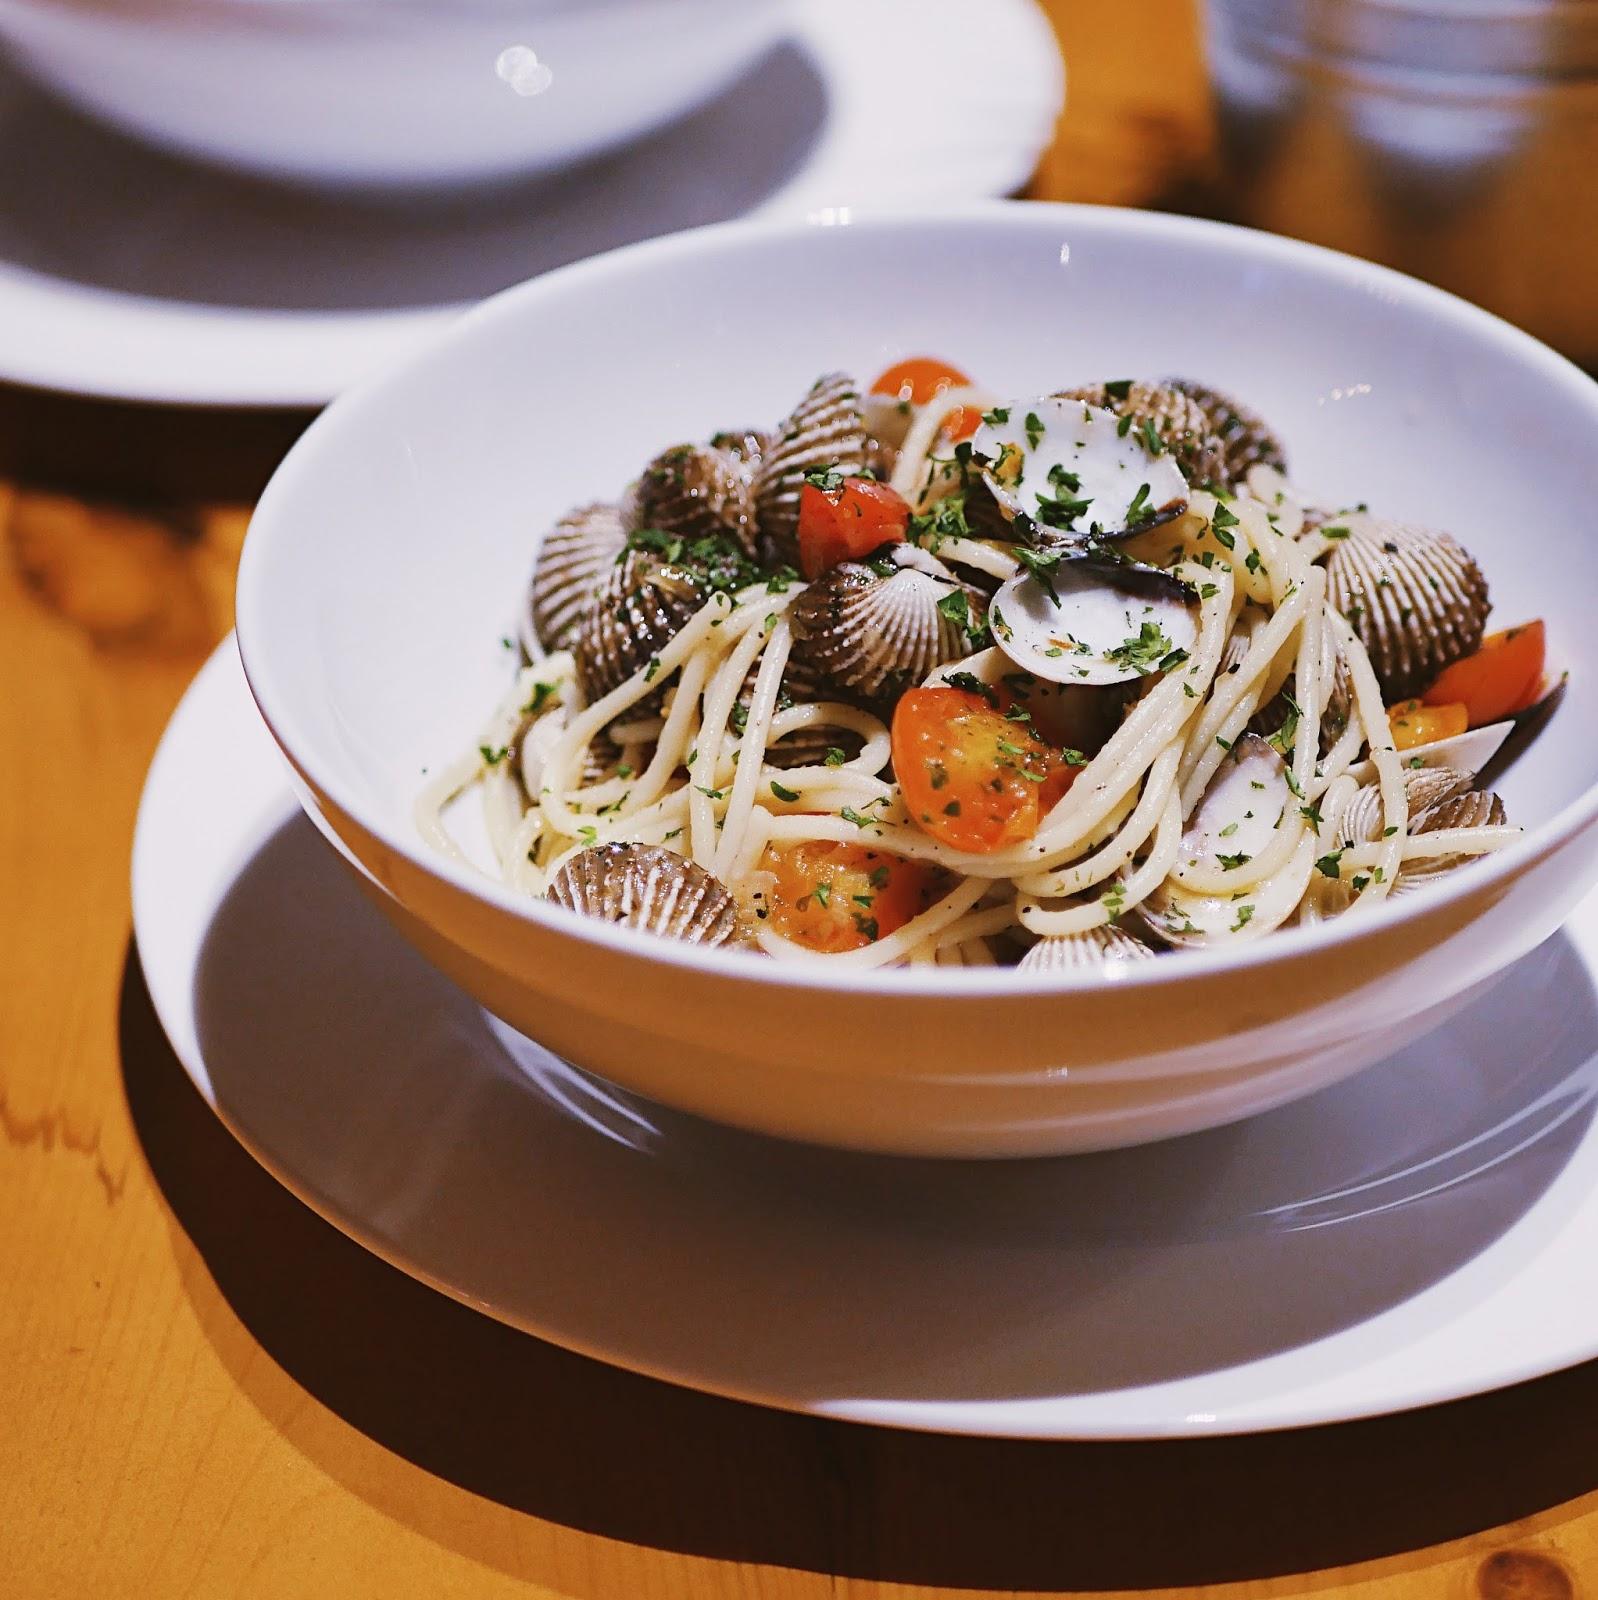 Indonesian Food Blogger & Photographer